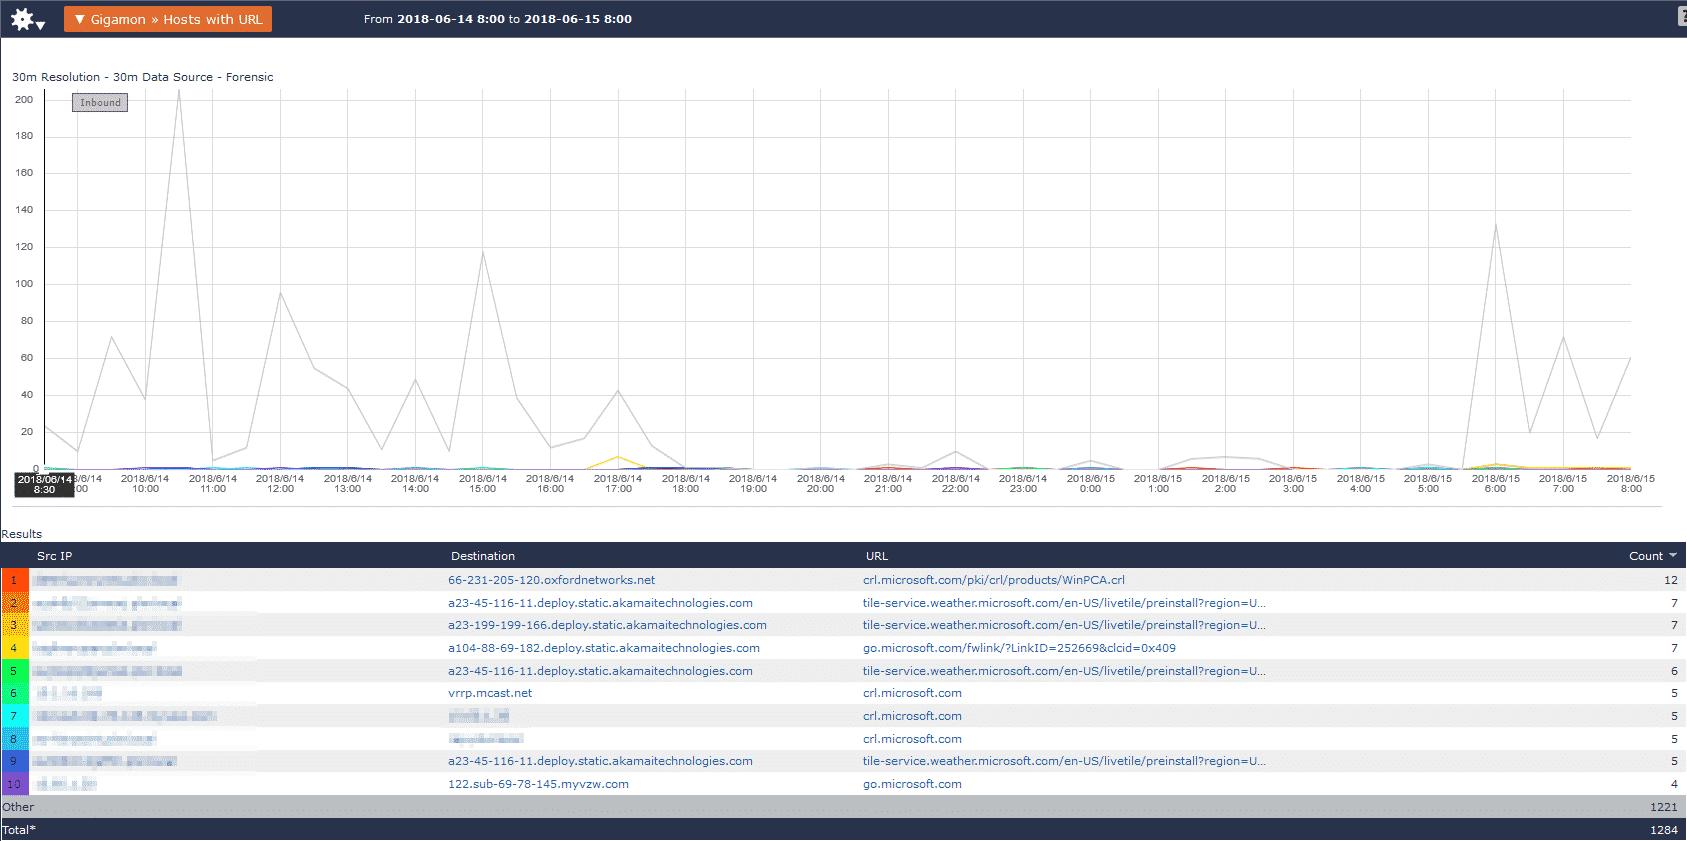 Historical data analysis